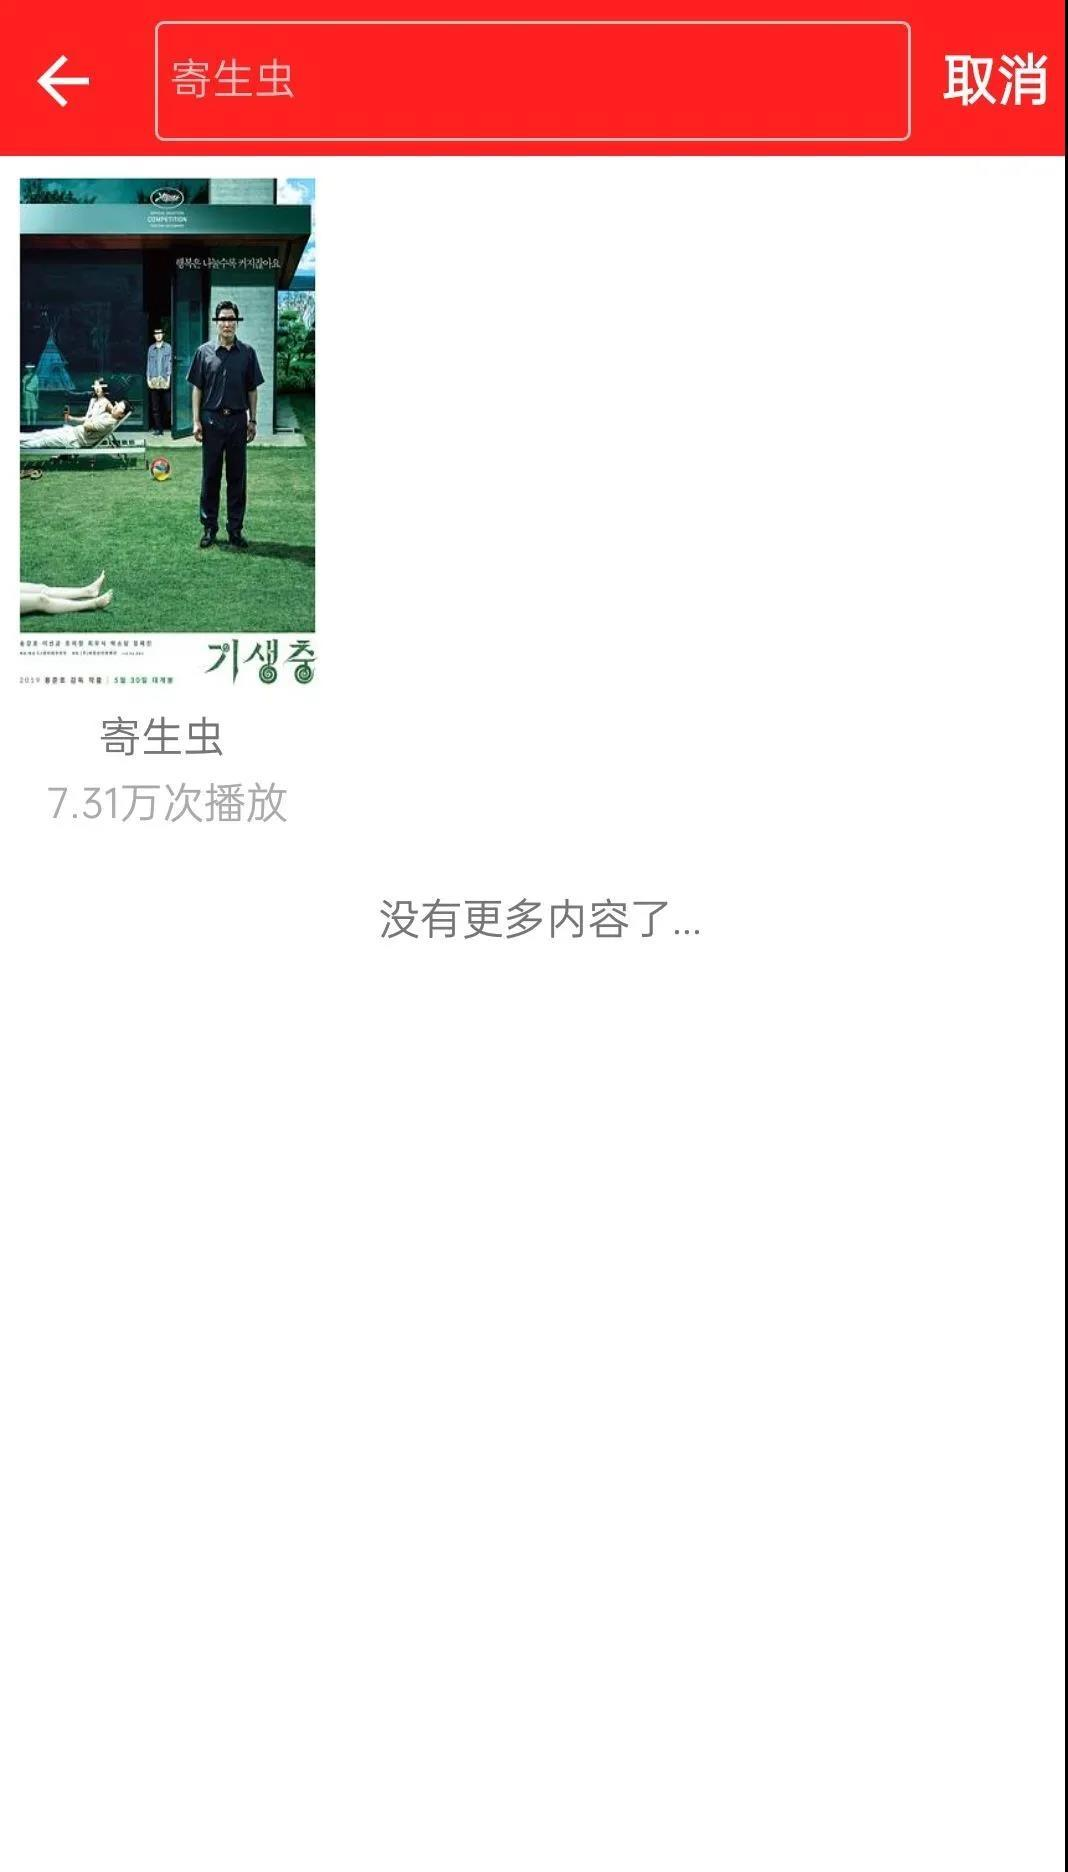 5eec8b5714195aa59407929e 春秋影视